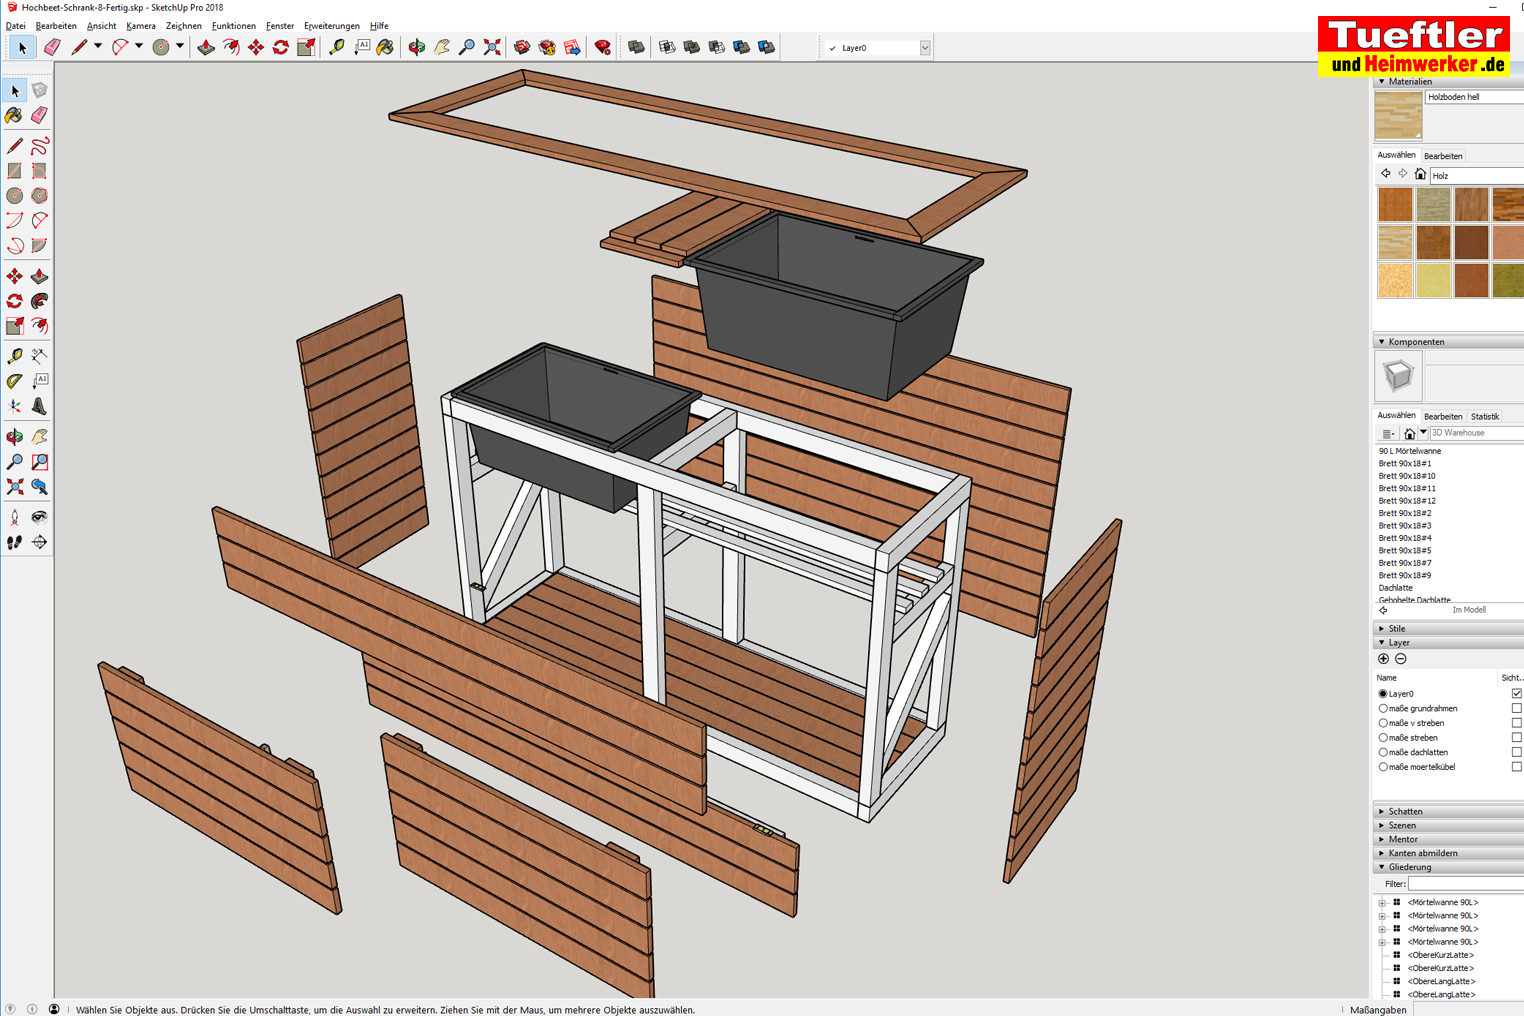 Hochbeet Mit Kombinierter Mullbox Selber Bauen Diy Projekttueftler U Balcony Garden Balcony In 2020 Backyard Landscaping Designs Diy Wood Furniture Living Room